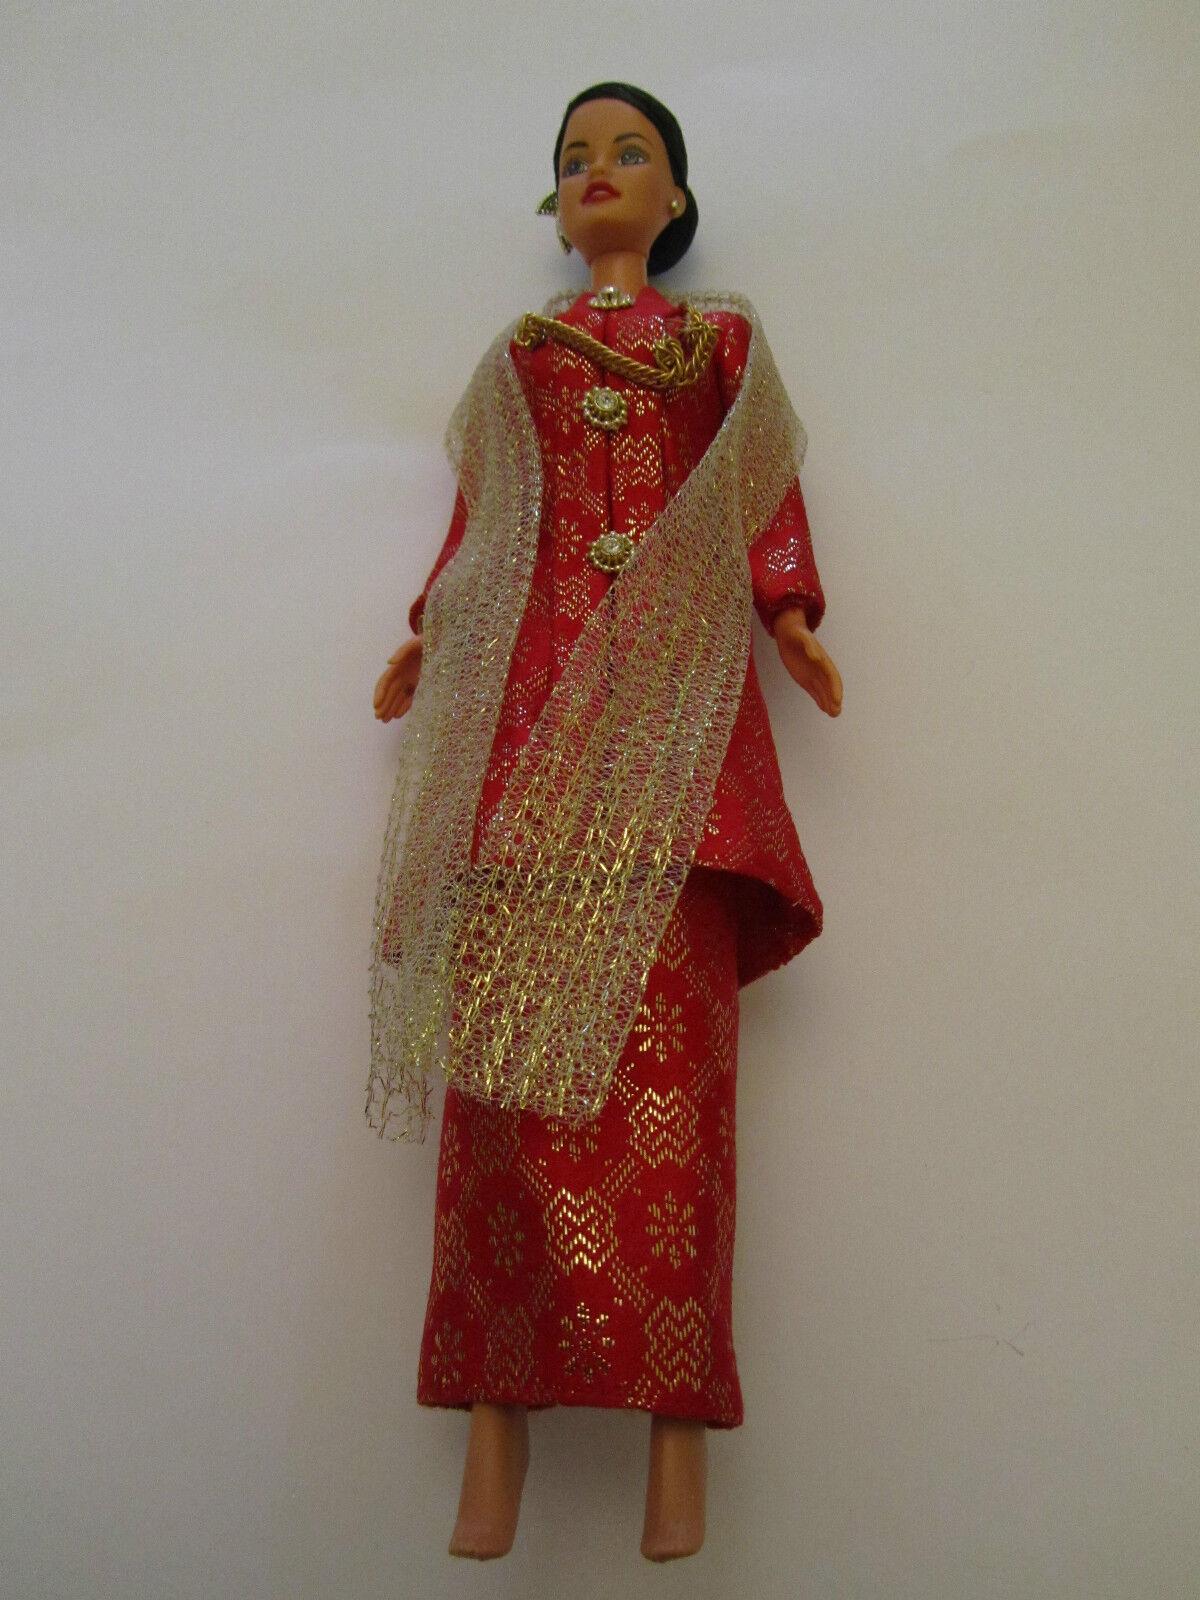 Barbie Barbie Barbie Dolls of the World Malaysian Malaysia - unused no schuhe - Apec 98 - Rare b5b745